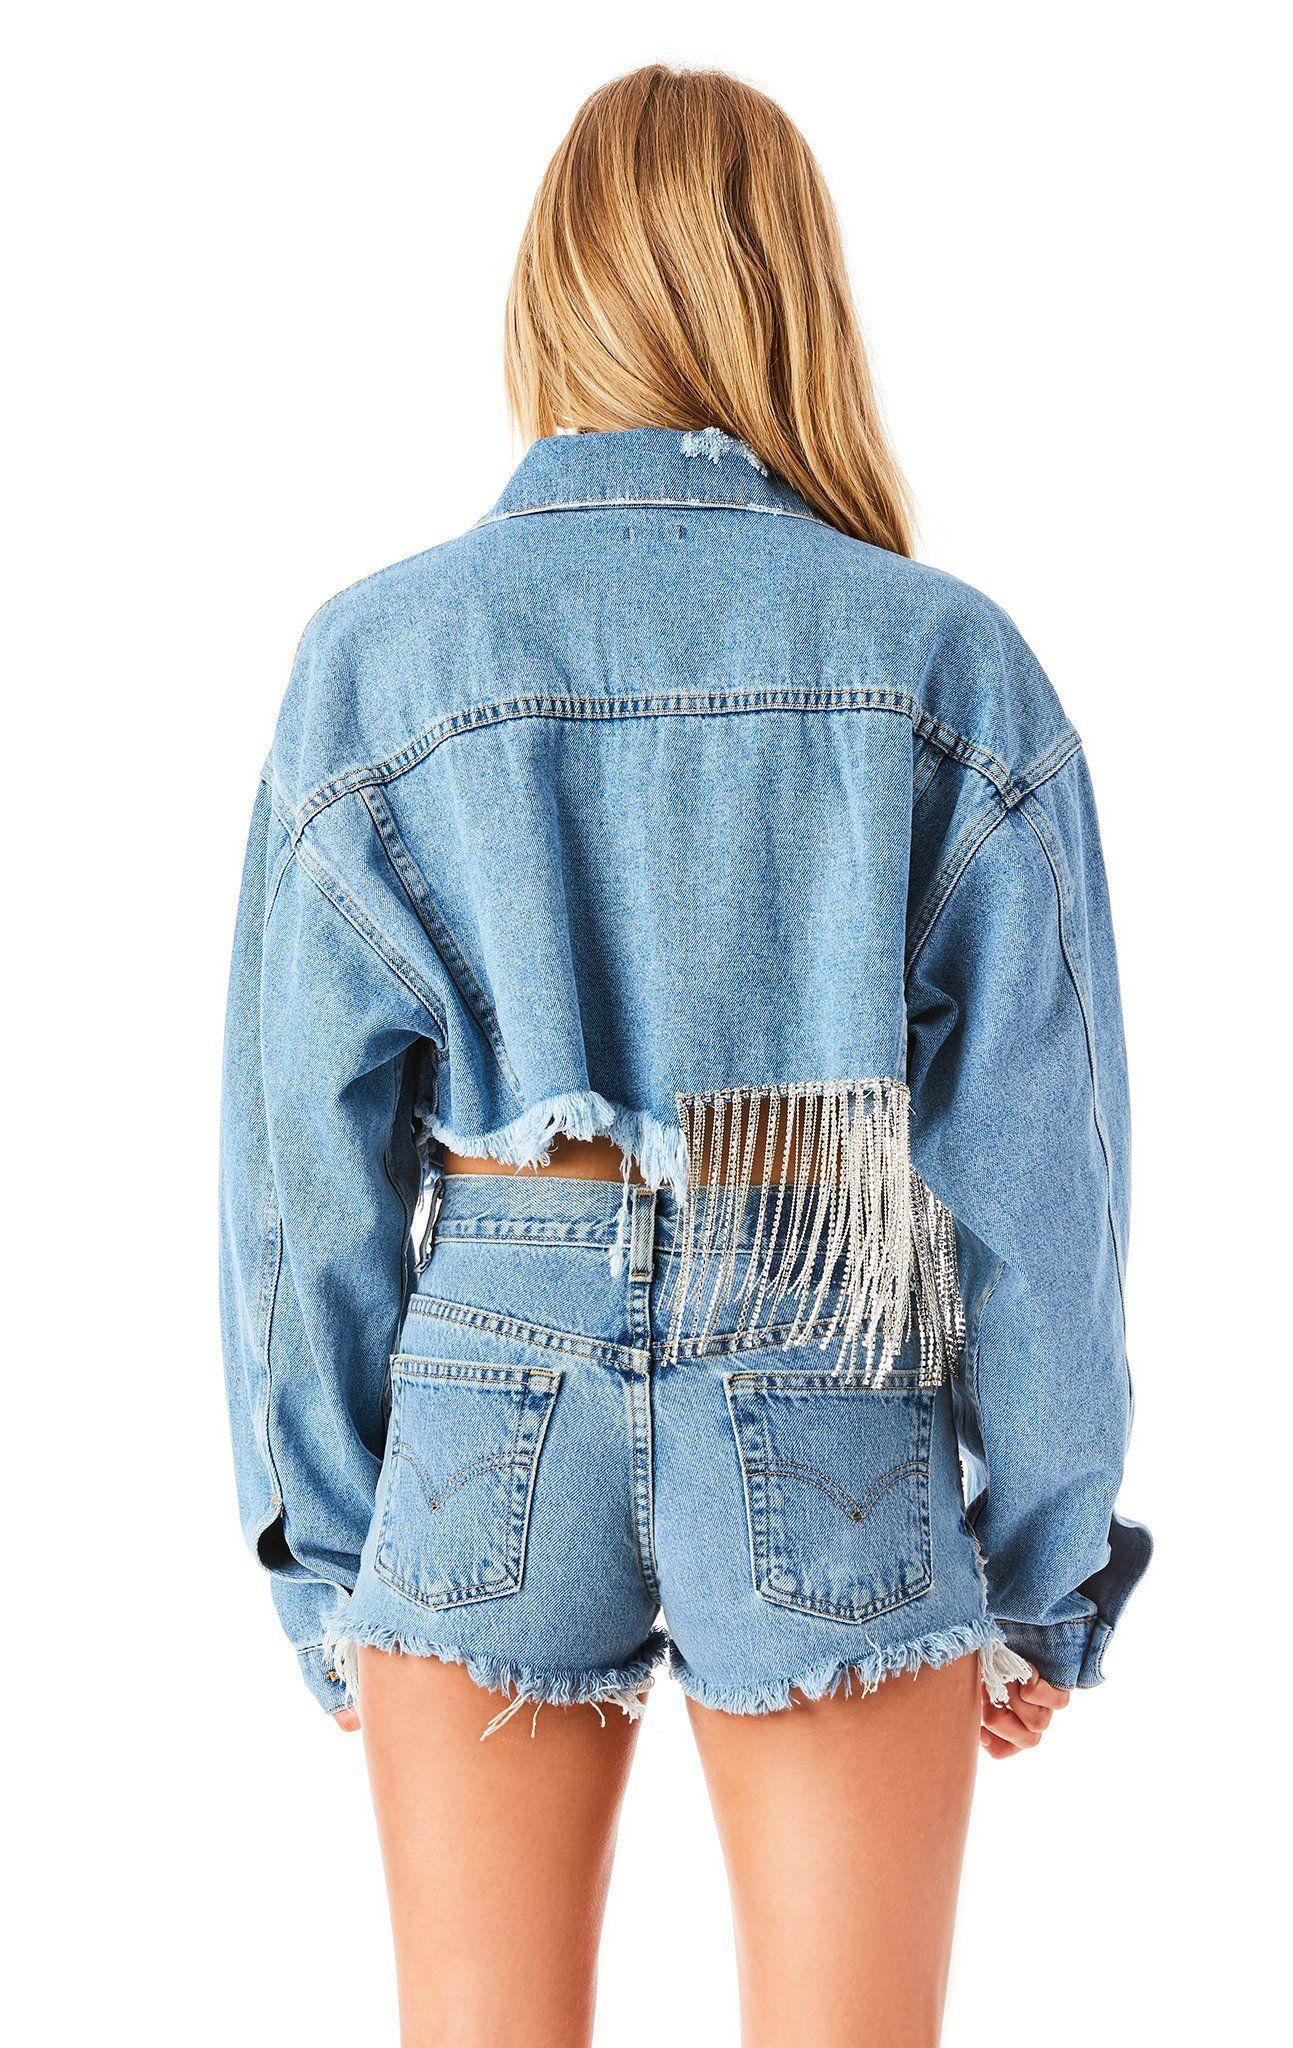 Audrey Mystic Rhinestone Fringe Crop Denim Jacket Diy Denim Jacket Denim Jacket Cropped Denim [ 2048 x 1293 Pixel ]